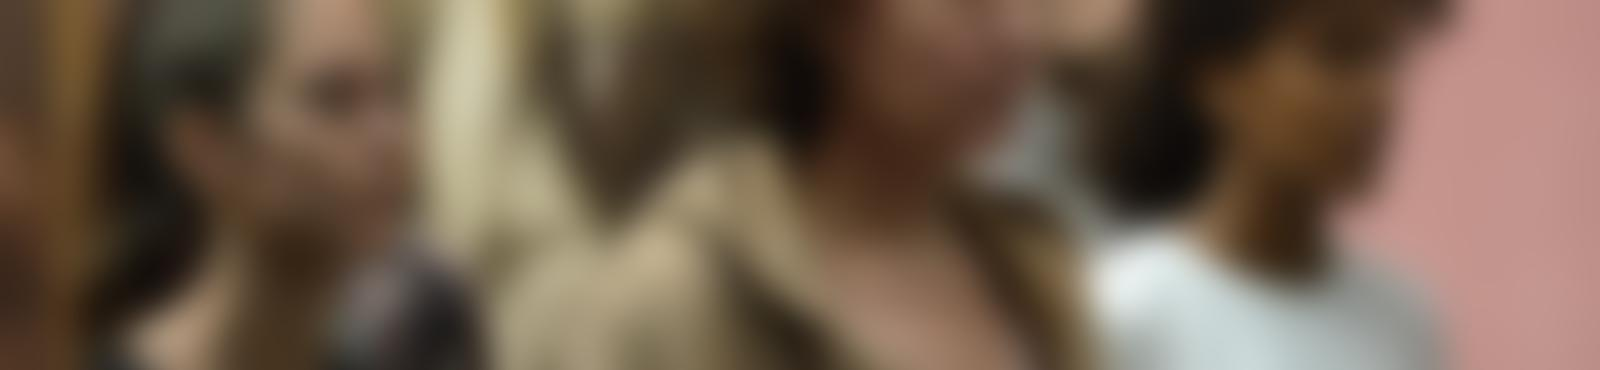 Blurred b0d6ac09 009a 418d 9397 ab3540a94a98